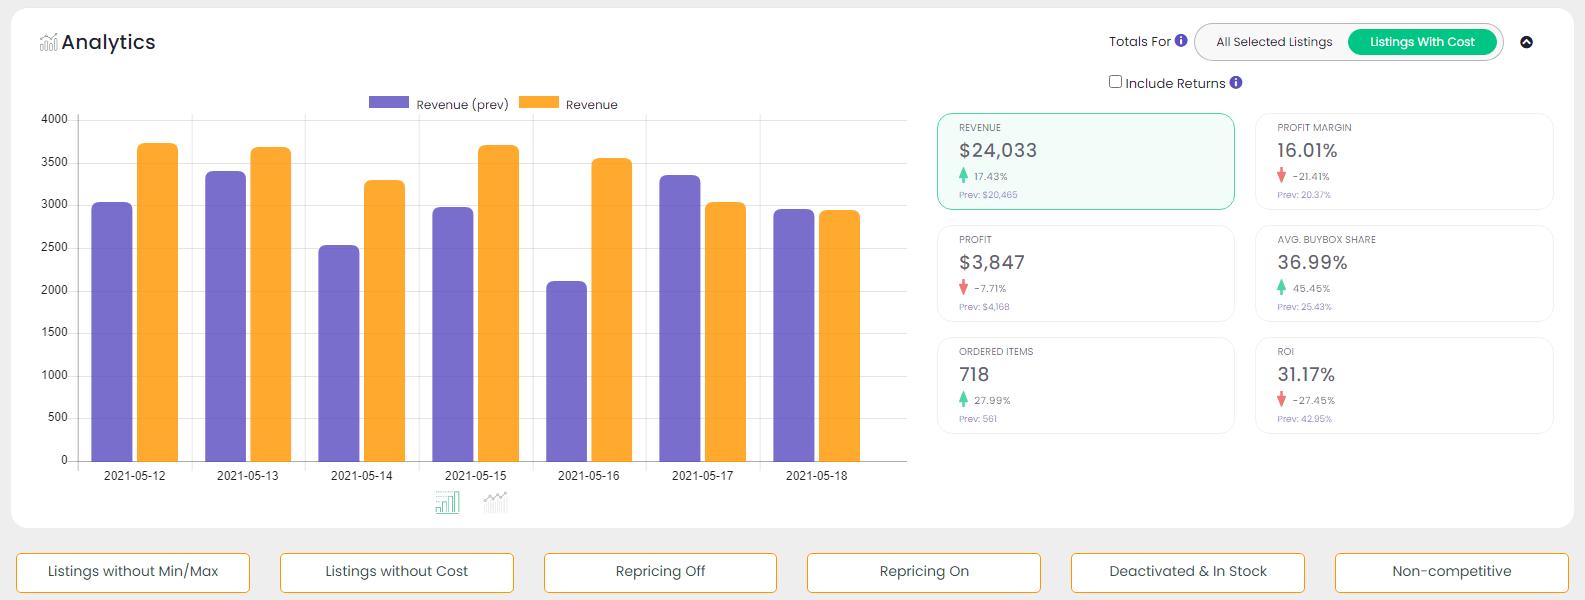 sellersnap-analytics-dashboard